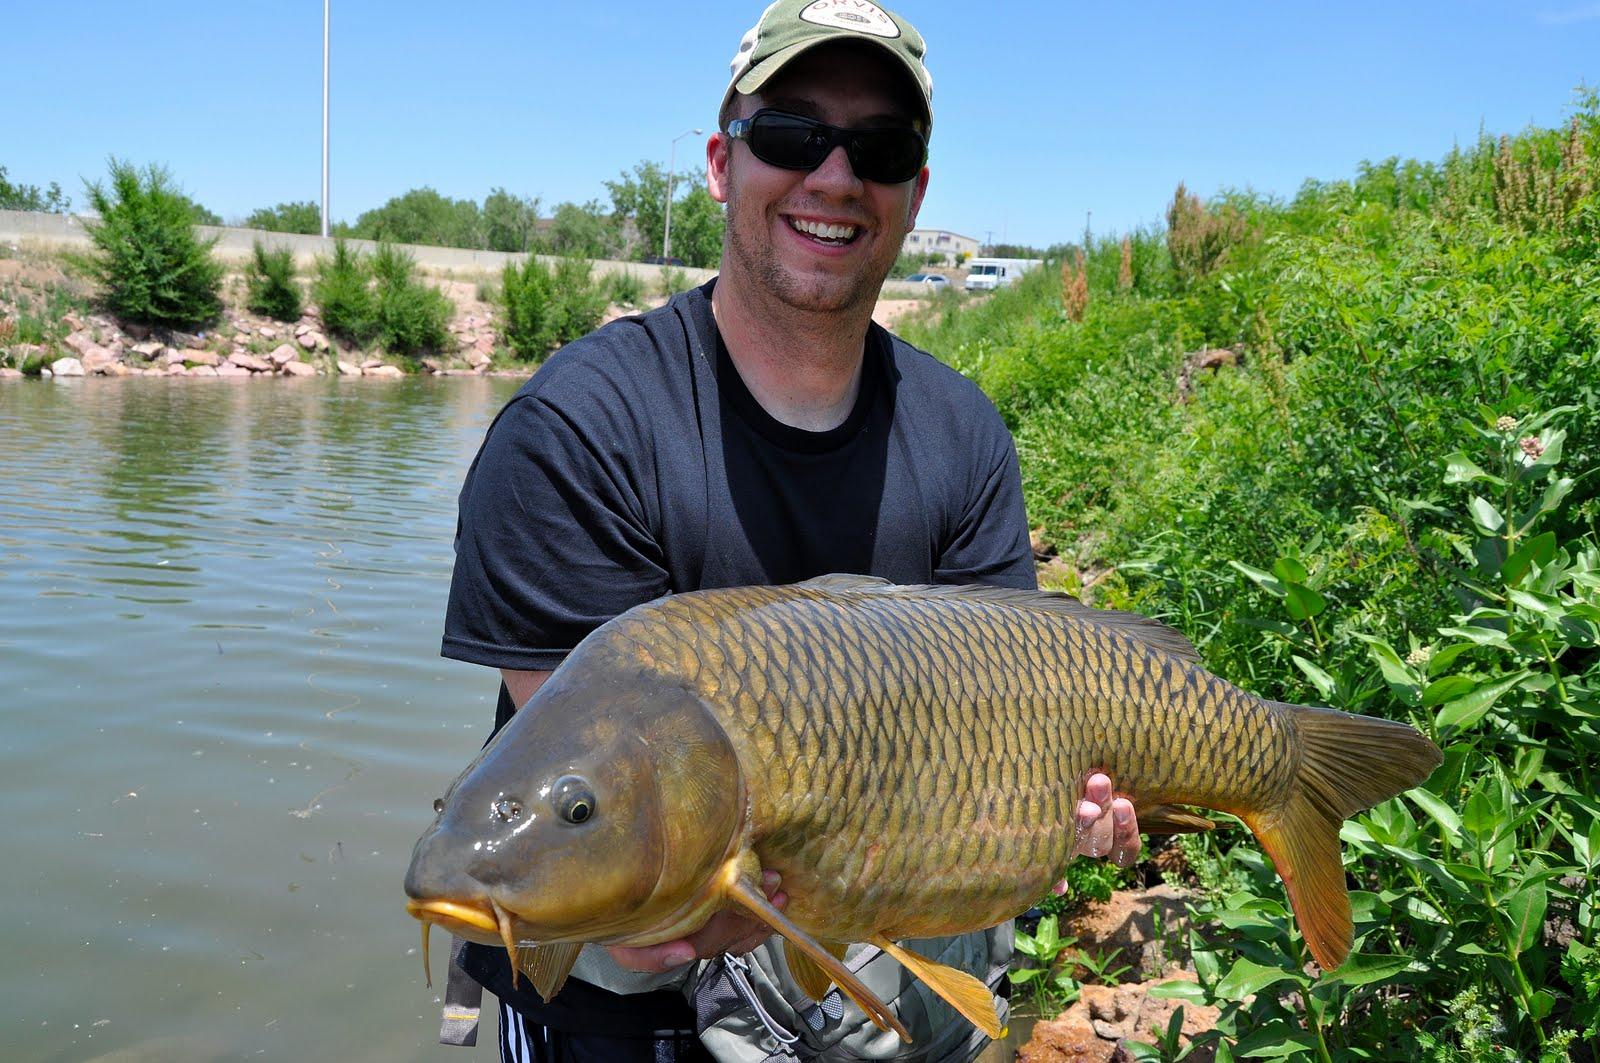 Colorado springs urban flyfishing investment banking for Colorado springs fishing